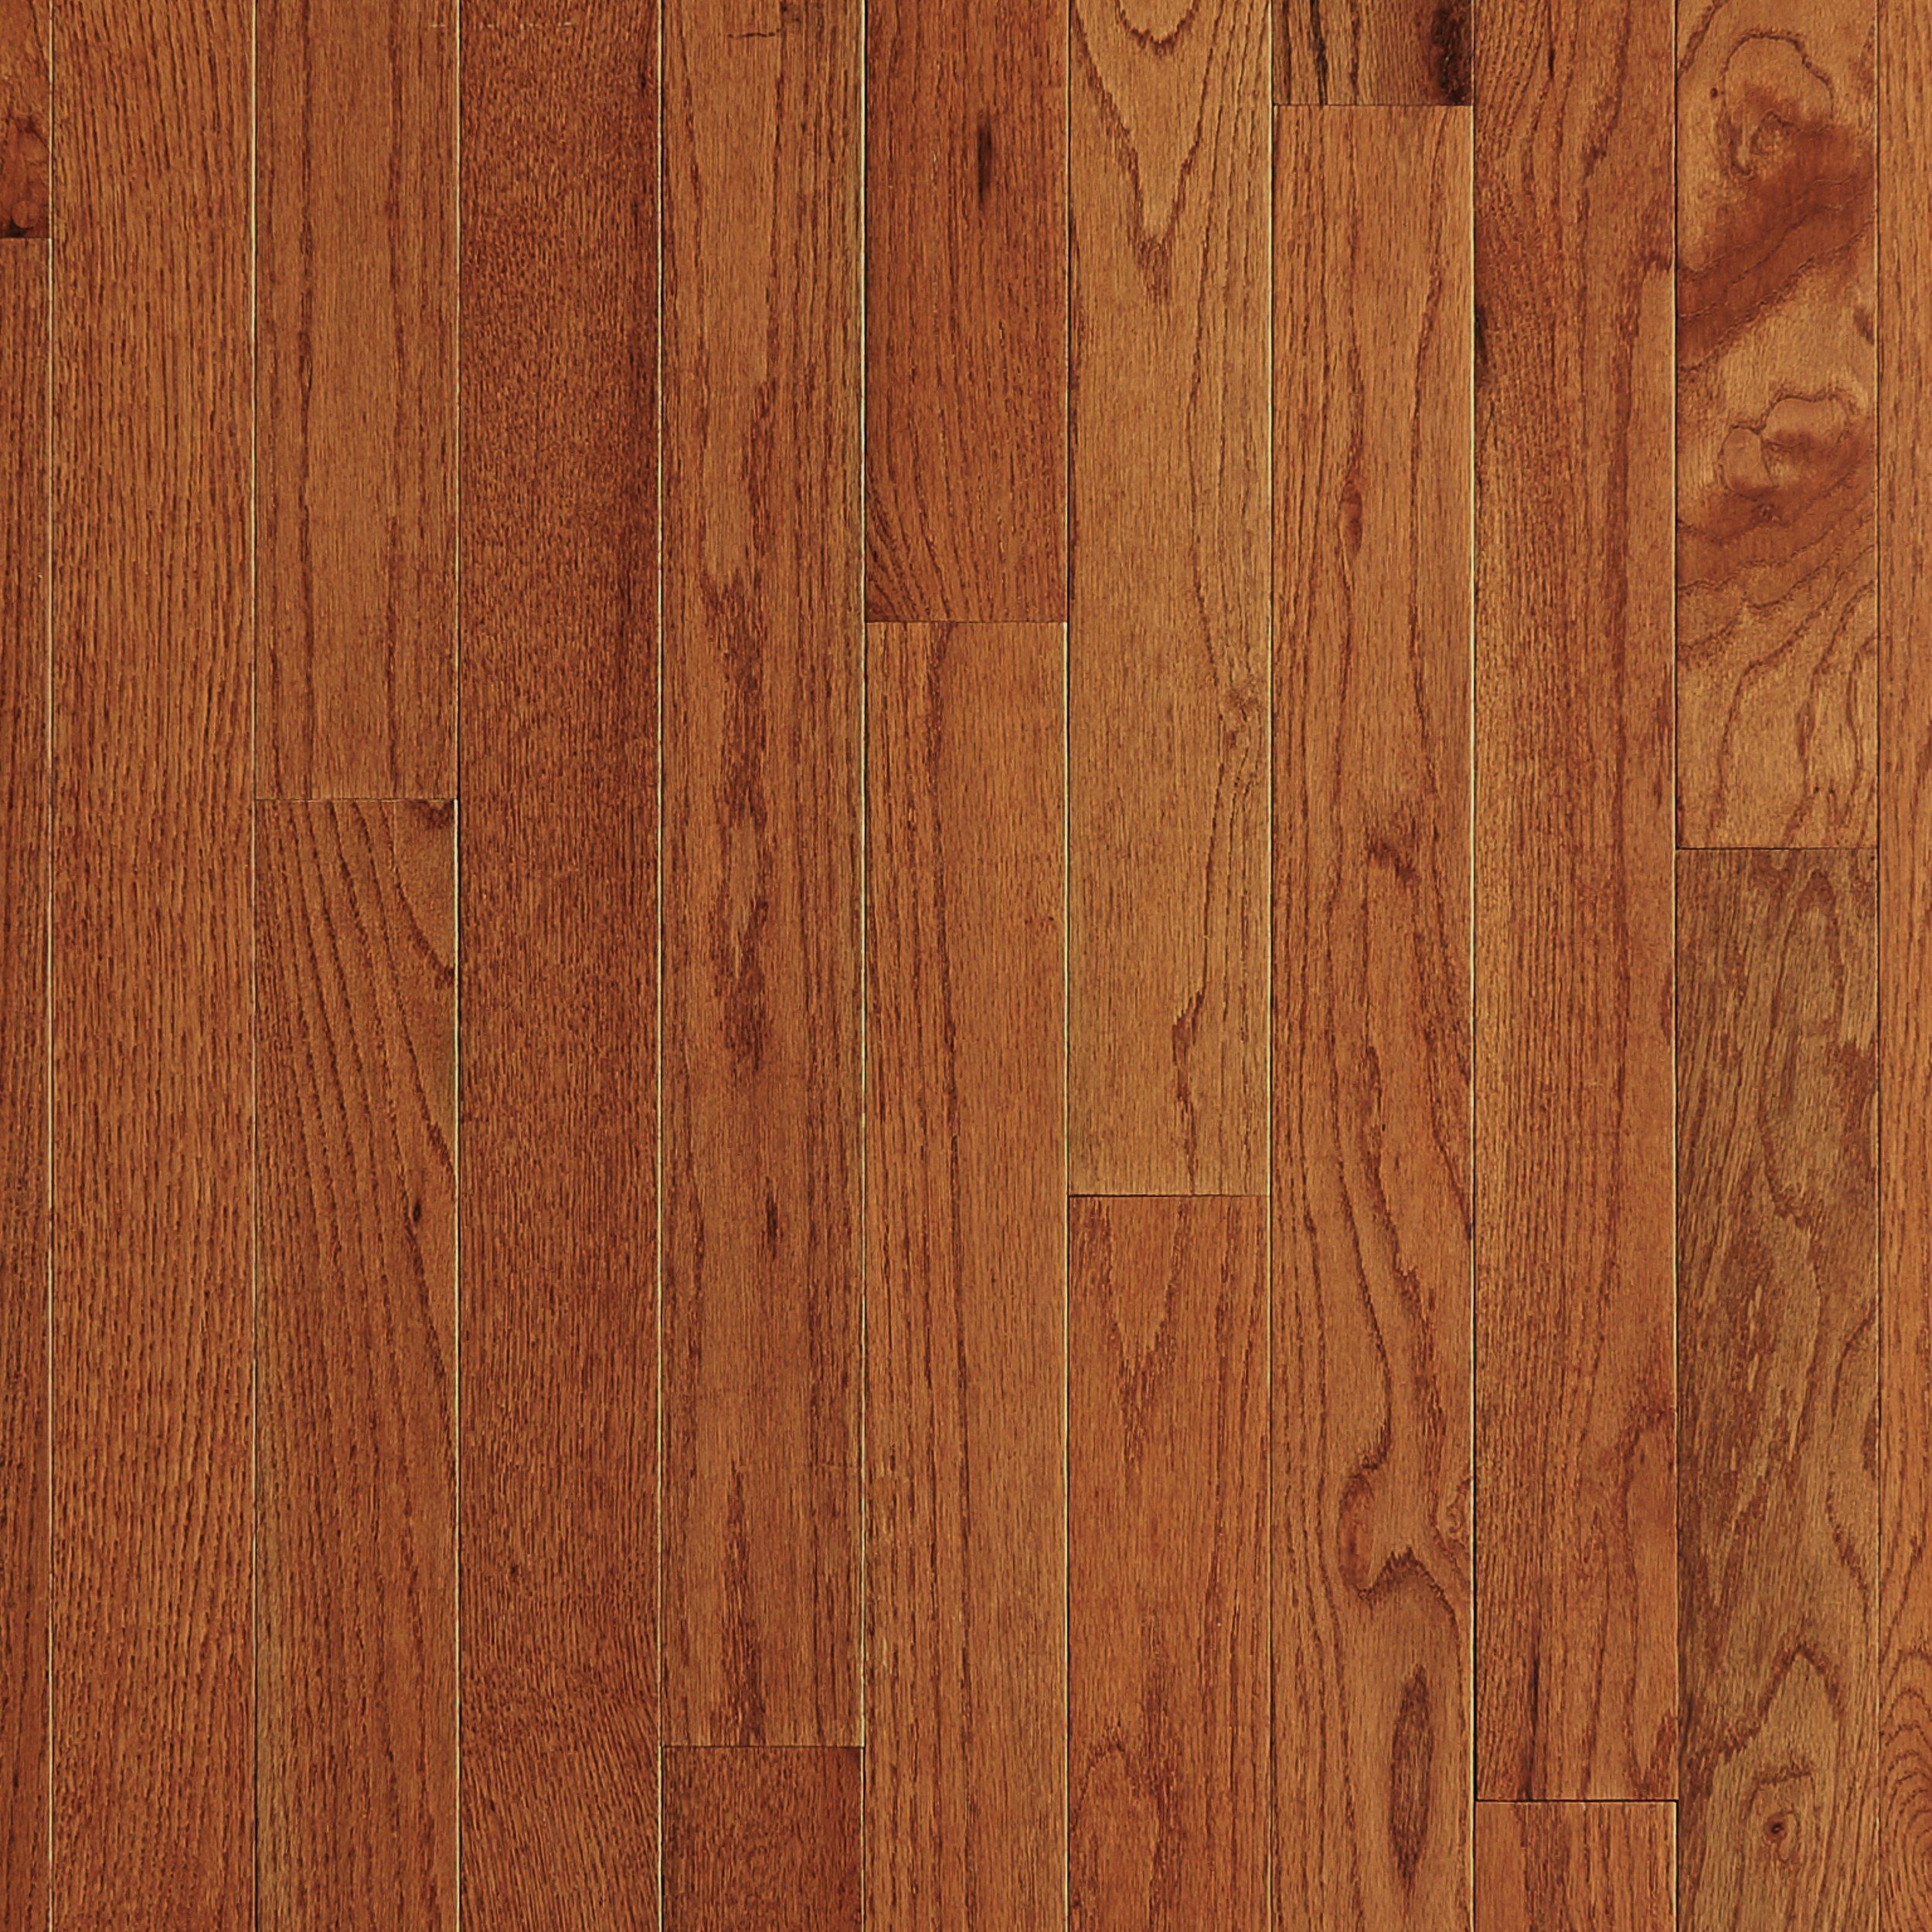 Gunstock Oak Solid Hardwood Floor Decor Hardwood Floors Hardwood Solid Hardwood Floors